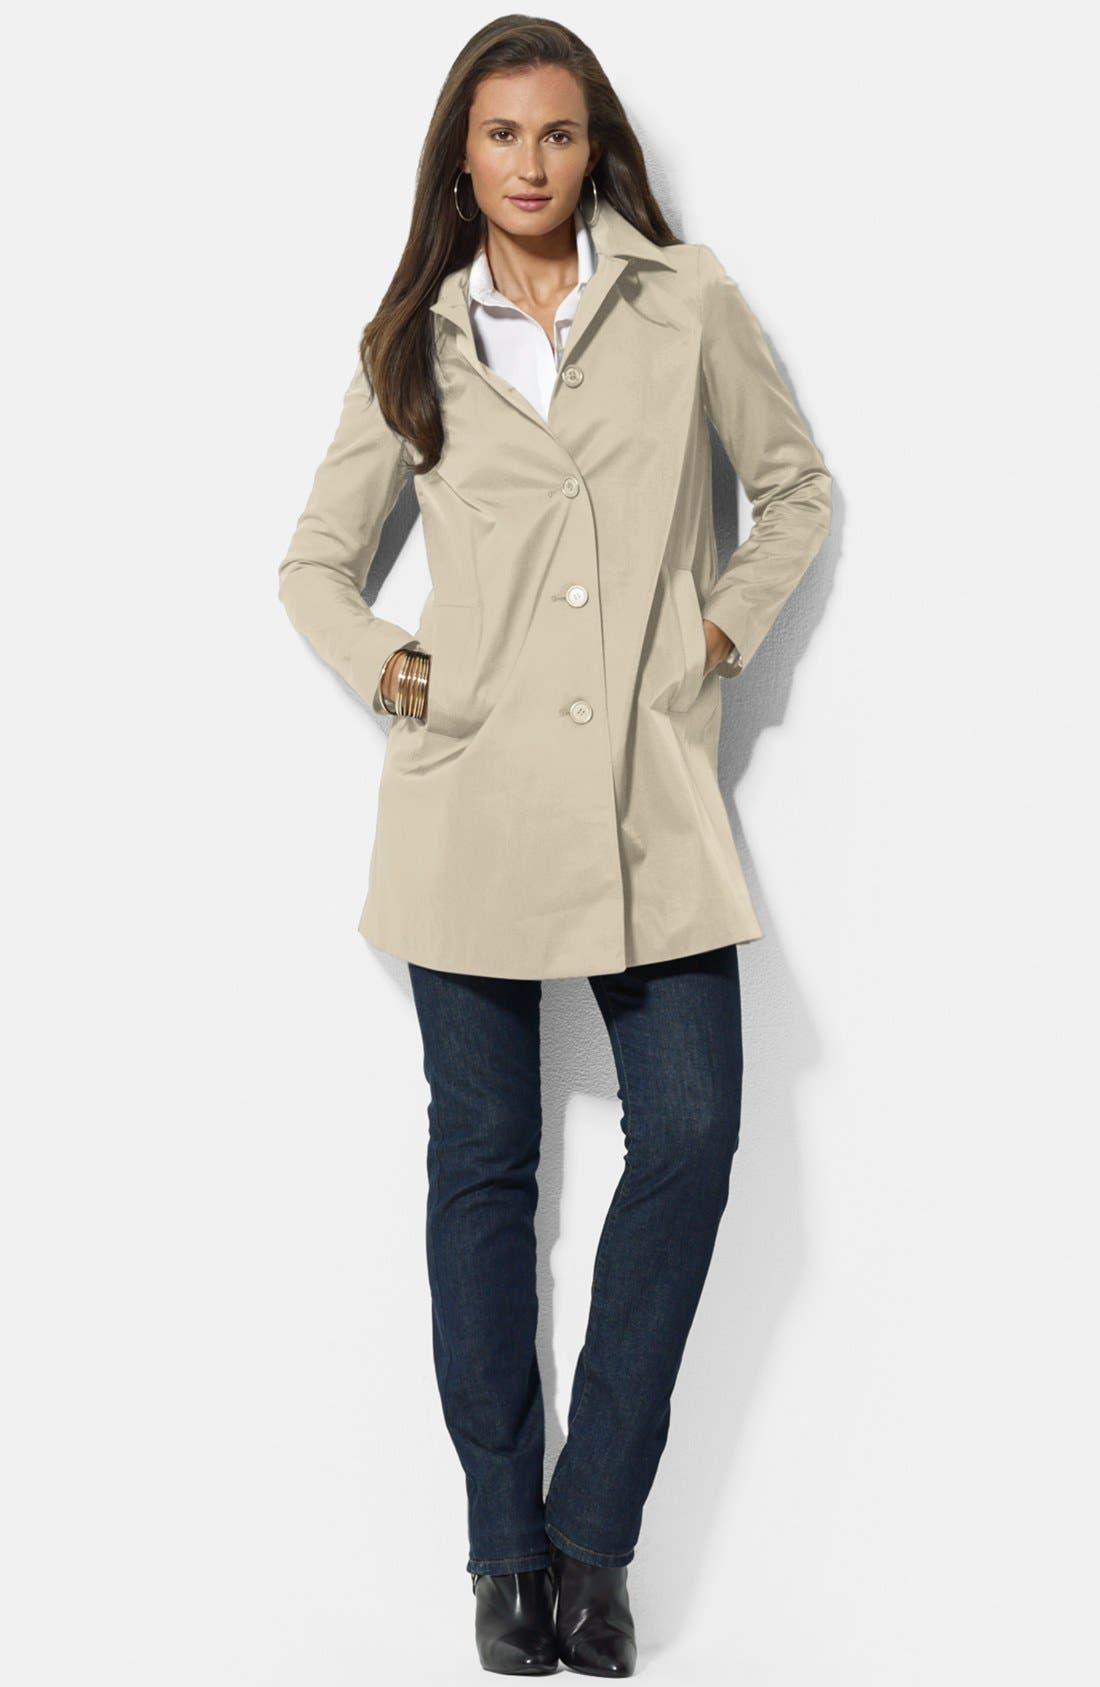 Main Image - Lauren Ralph Lauren Bonded Cotton A-Line Jacket with Detachable Hood